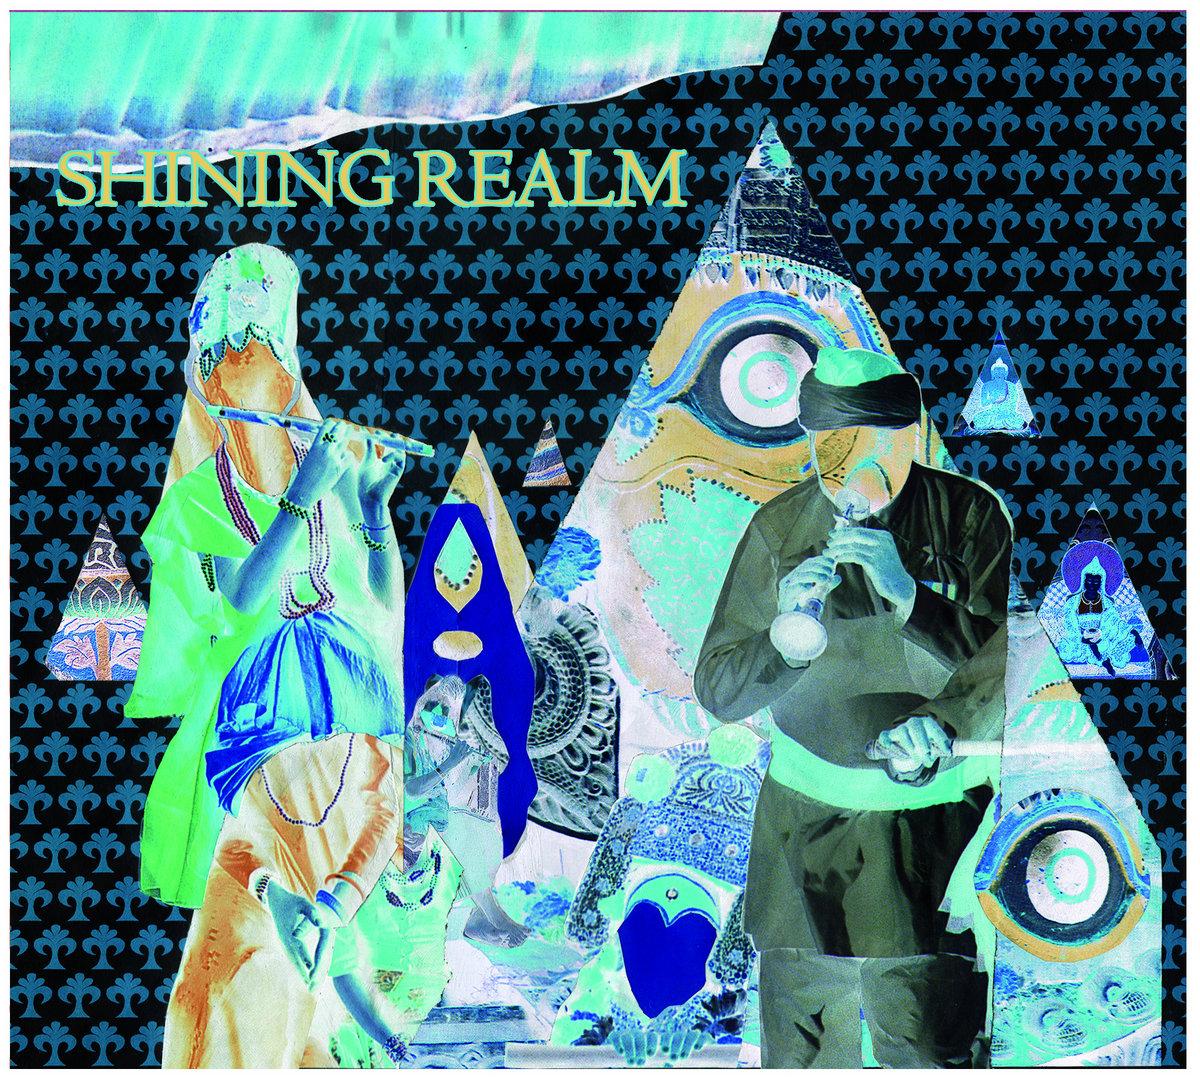 Shining Realm album cover